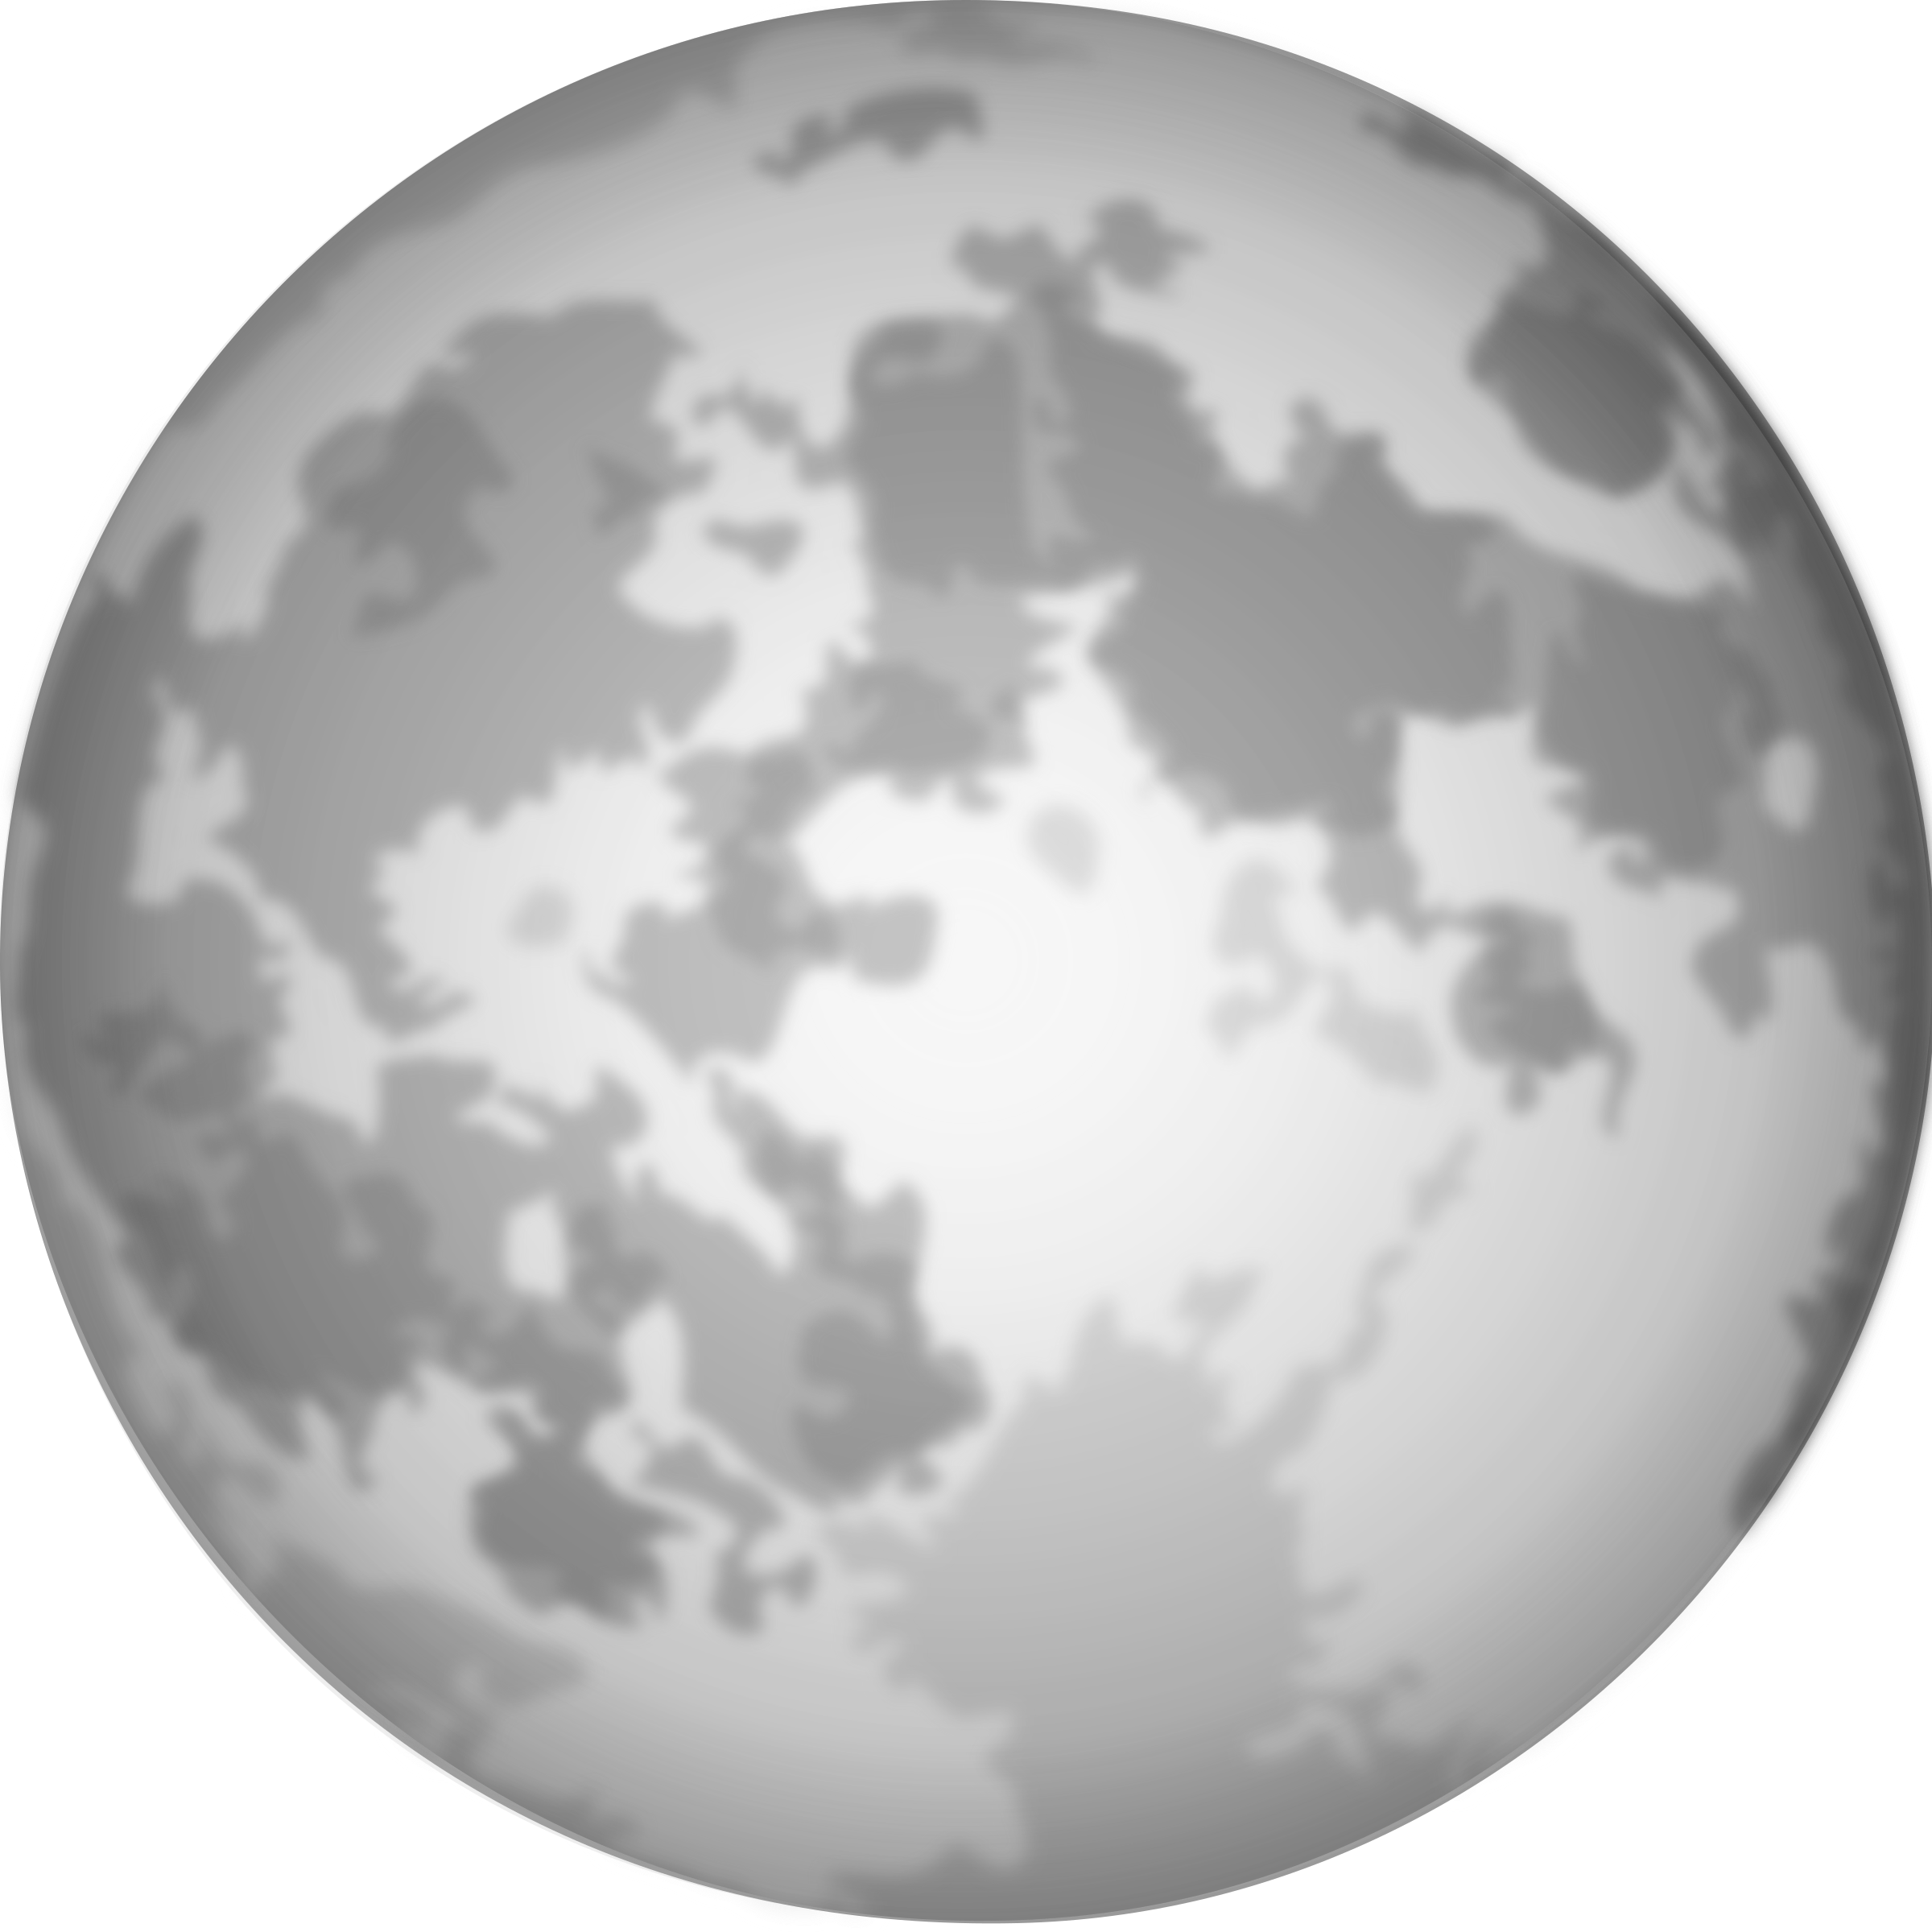 Full moon transparent clipart